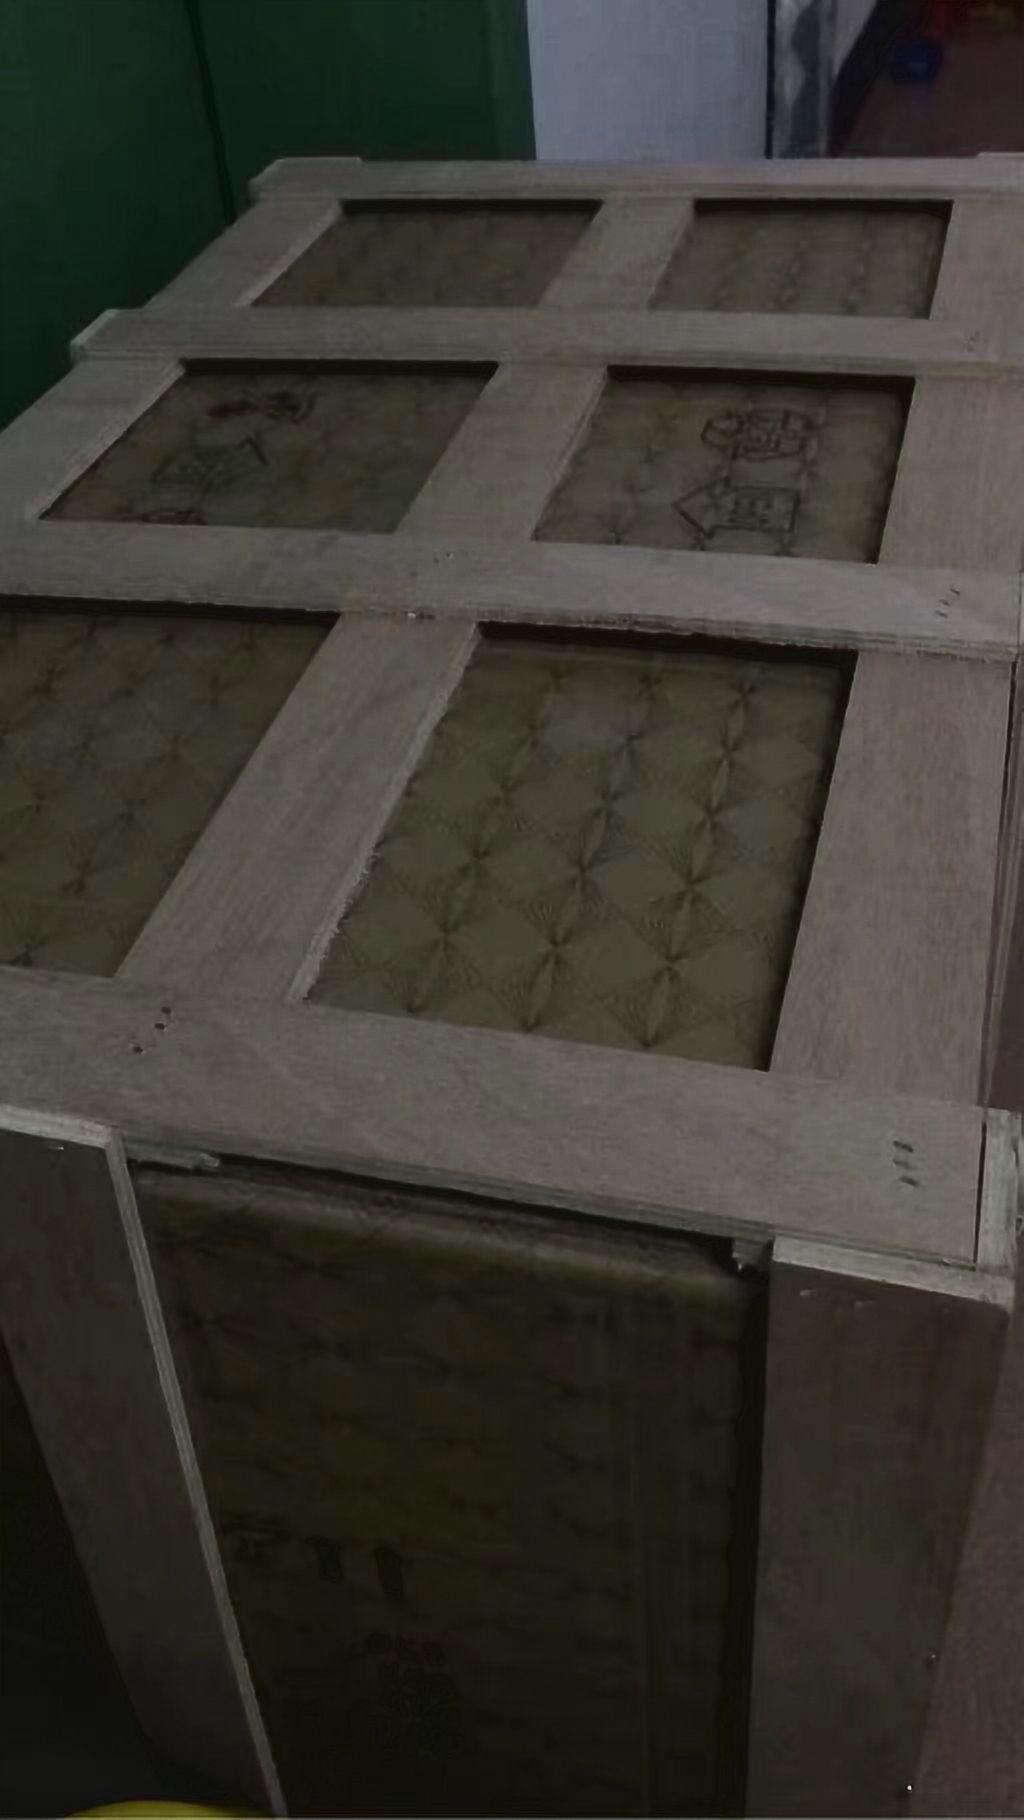 Frete grátis 100% soprado Borosilicate elegante romântico Art Decor New House Detalhes Dale Murano Vidro Led Chandelier